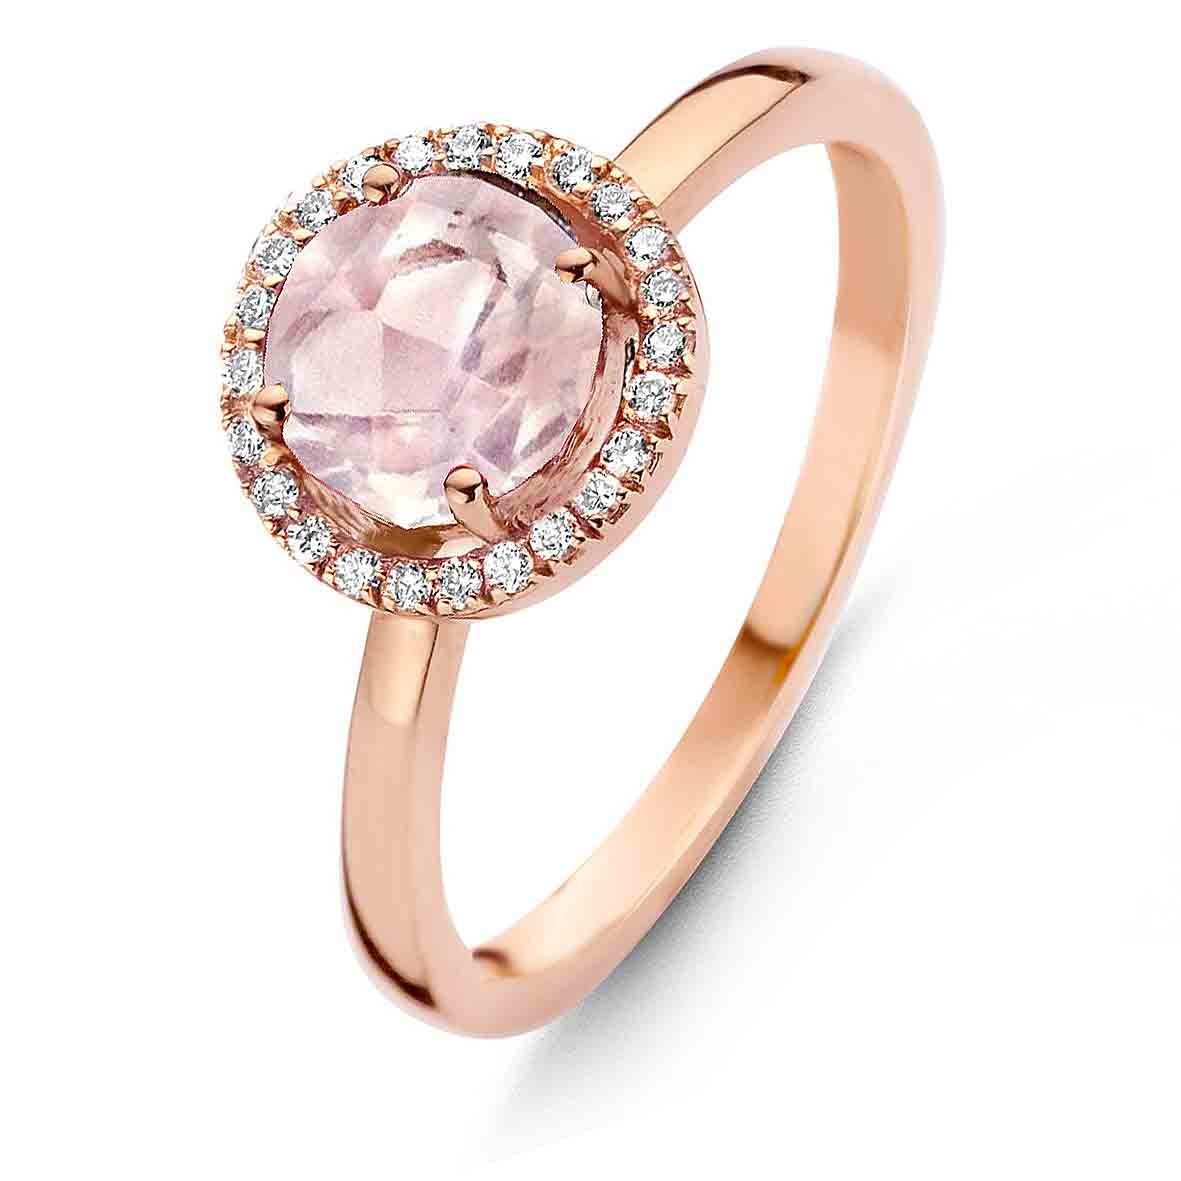 bague quartz rose diamants. Black Bedroom Furniture Sets. Home Design Ideas